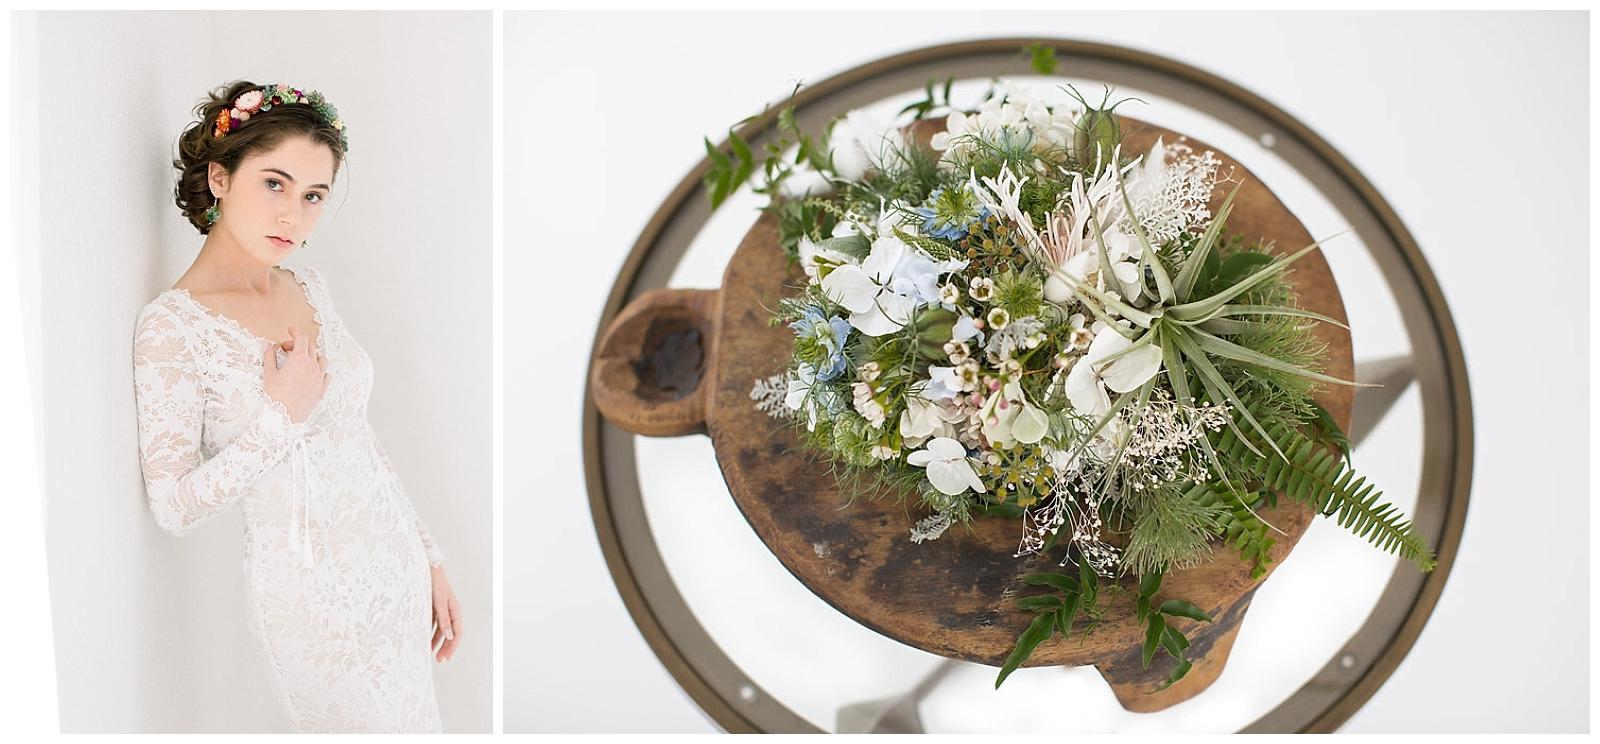 Living-Accessories-styled-shoot-de-joy-photography-epiphany-boutique-succulents.jpg